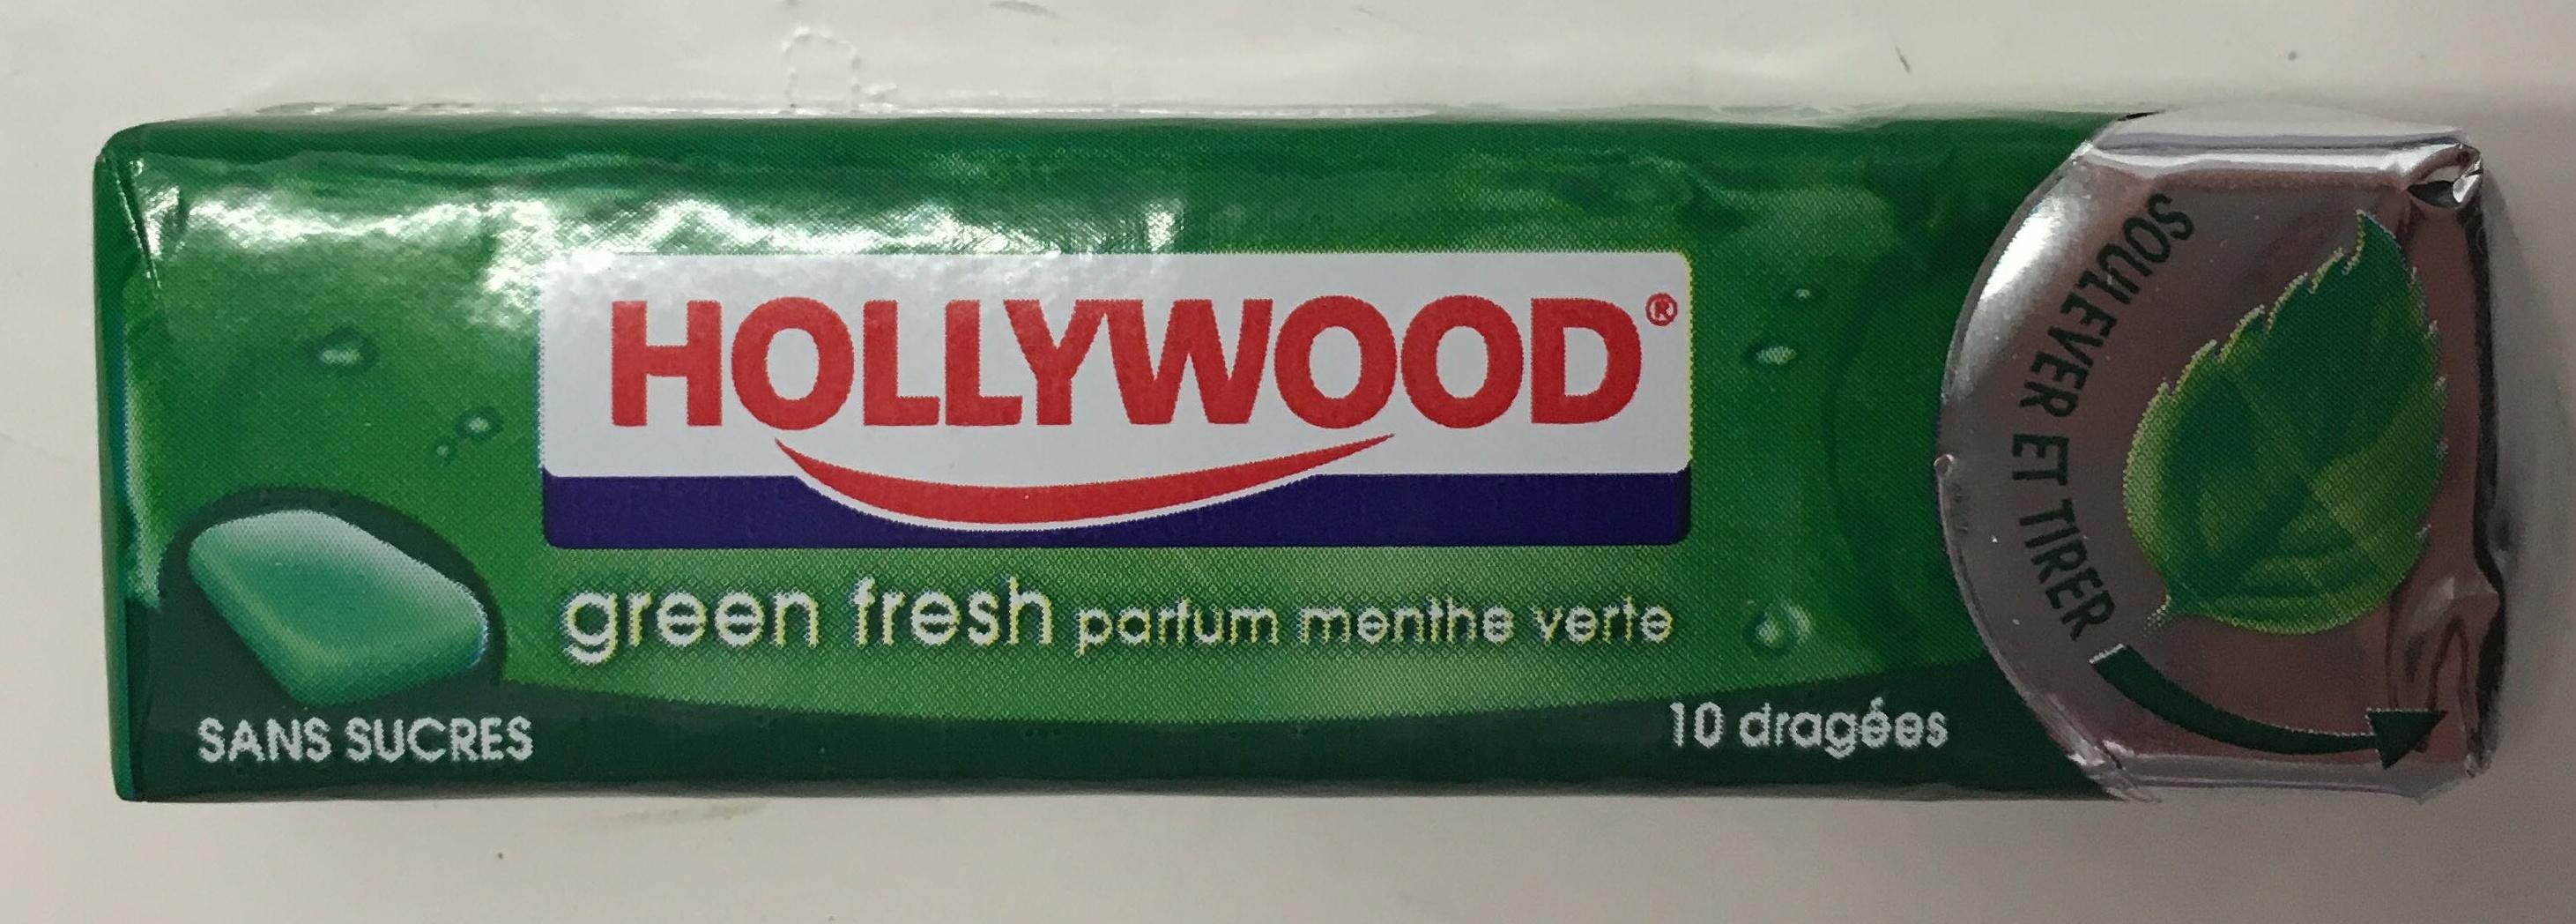 Green Fresh parfum menthe vente - Produit